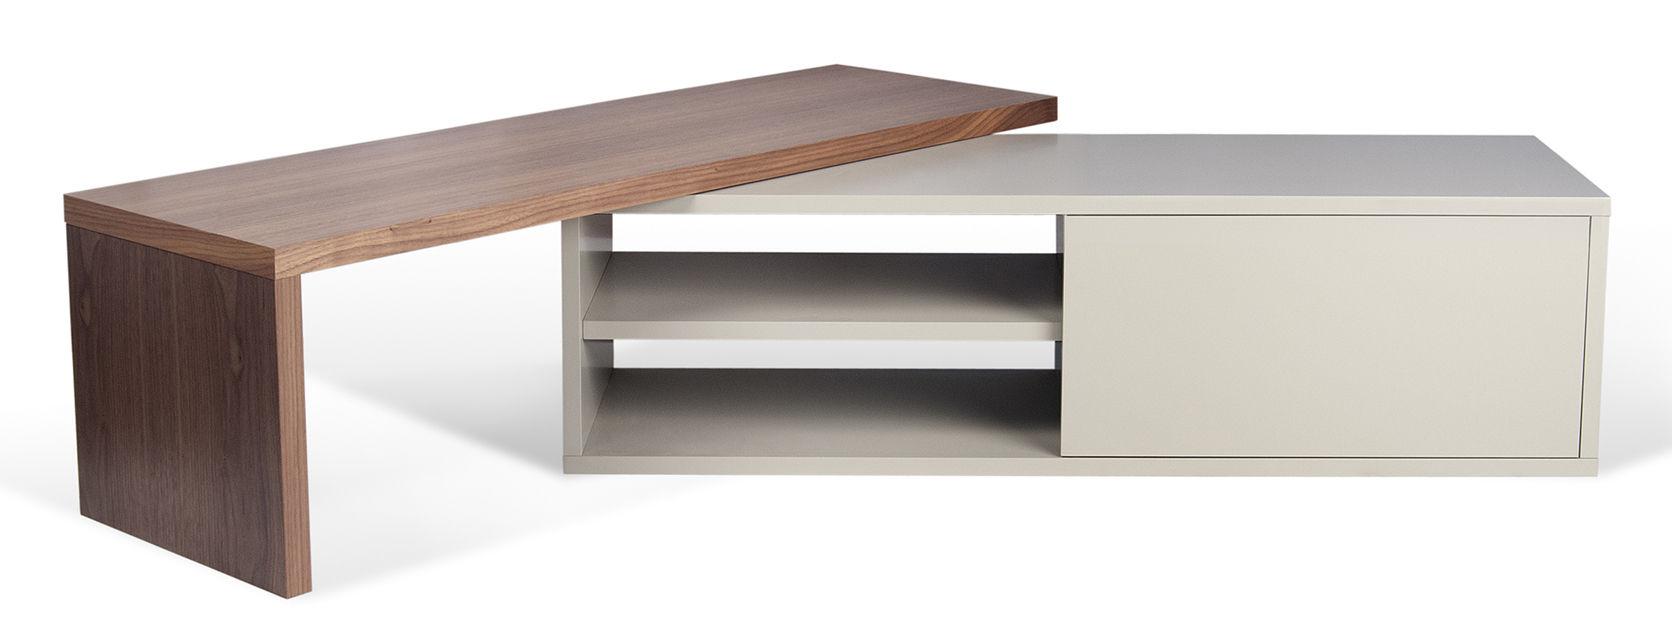 Meuble tv extensible slide pop up home gris made in design - Meuble tv 100 cm longueur ...